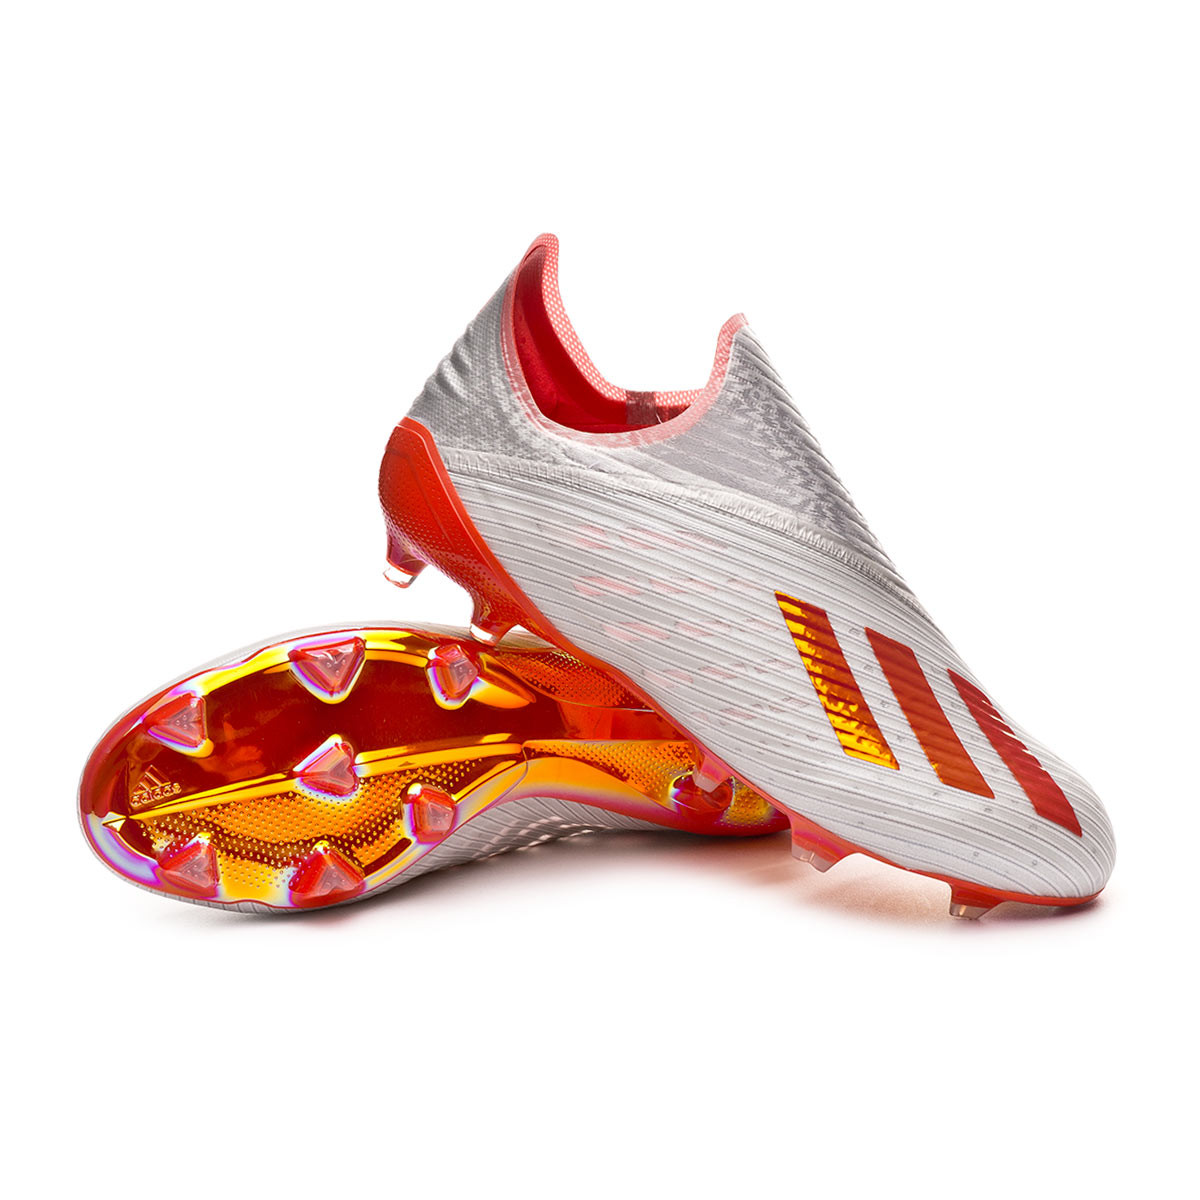 5cc1eb141 Football Boots adidas X 19+ FG Silver metallic-Hi red-White - Football  store Fútbol Emotion